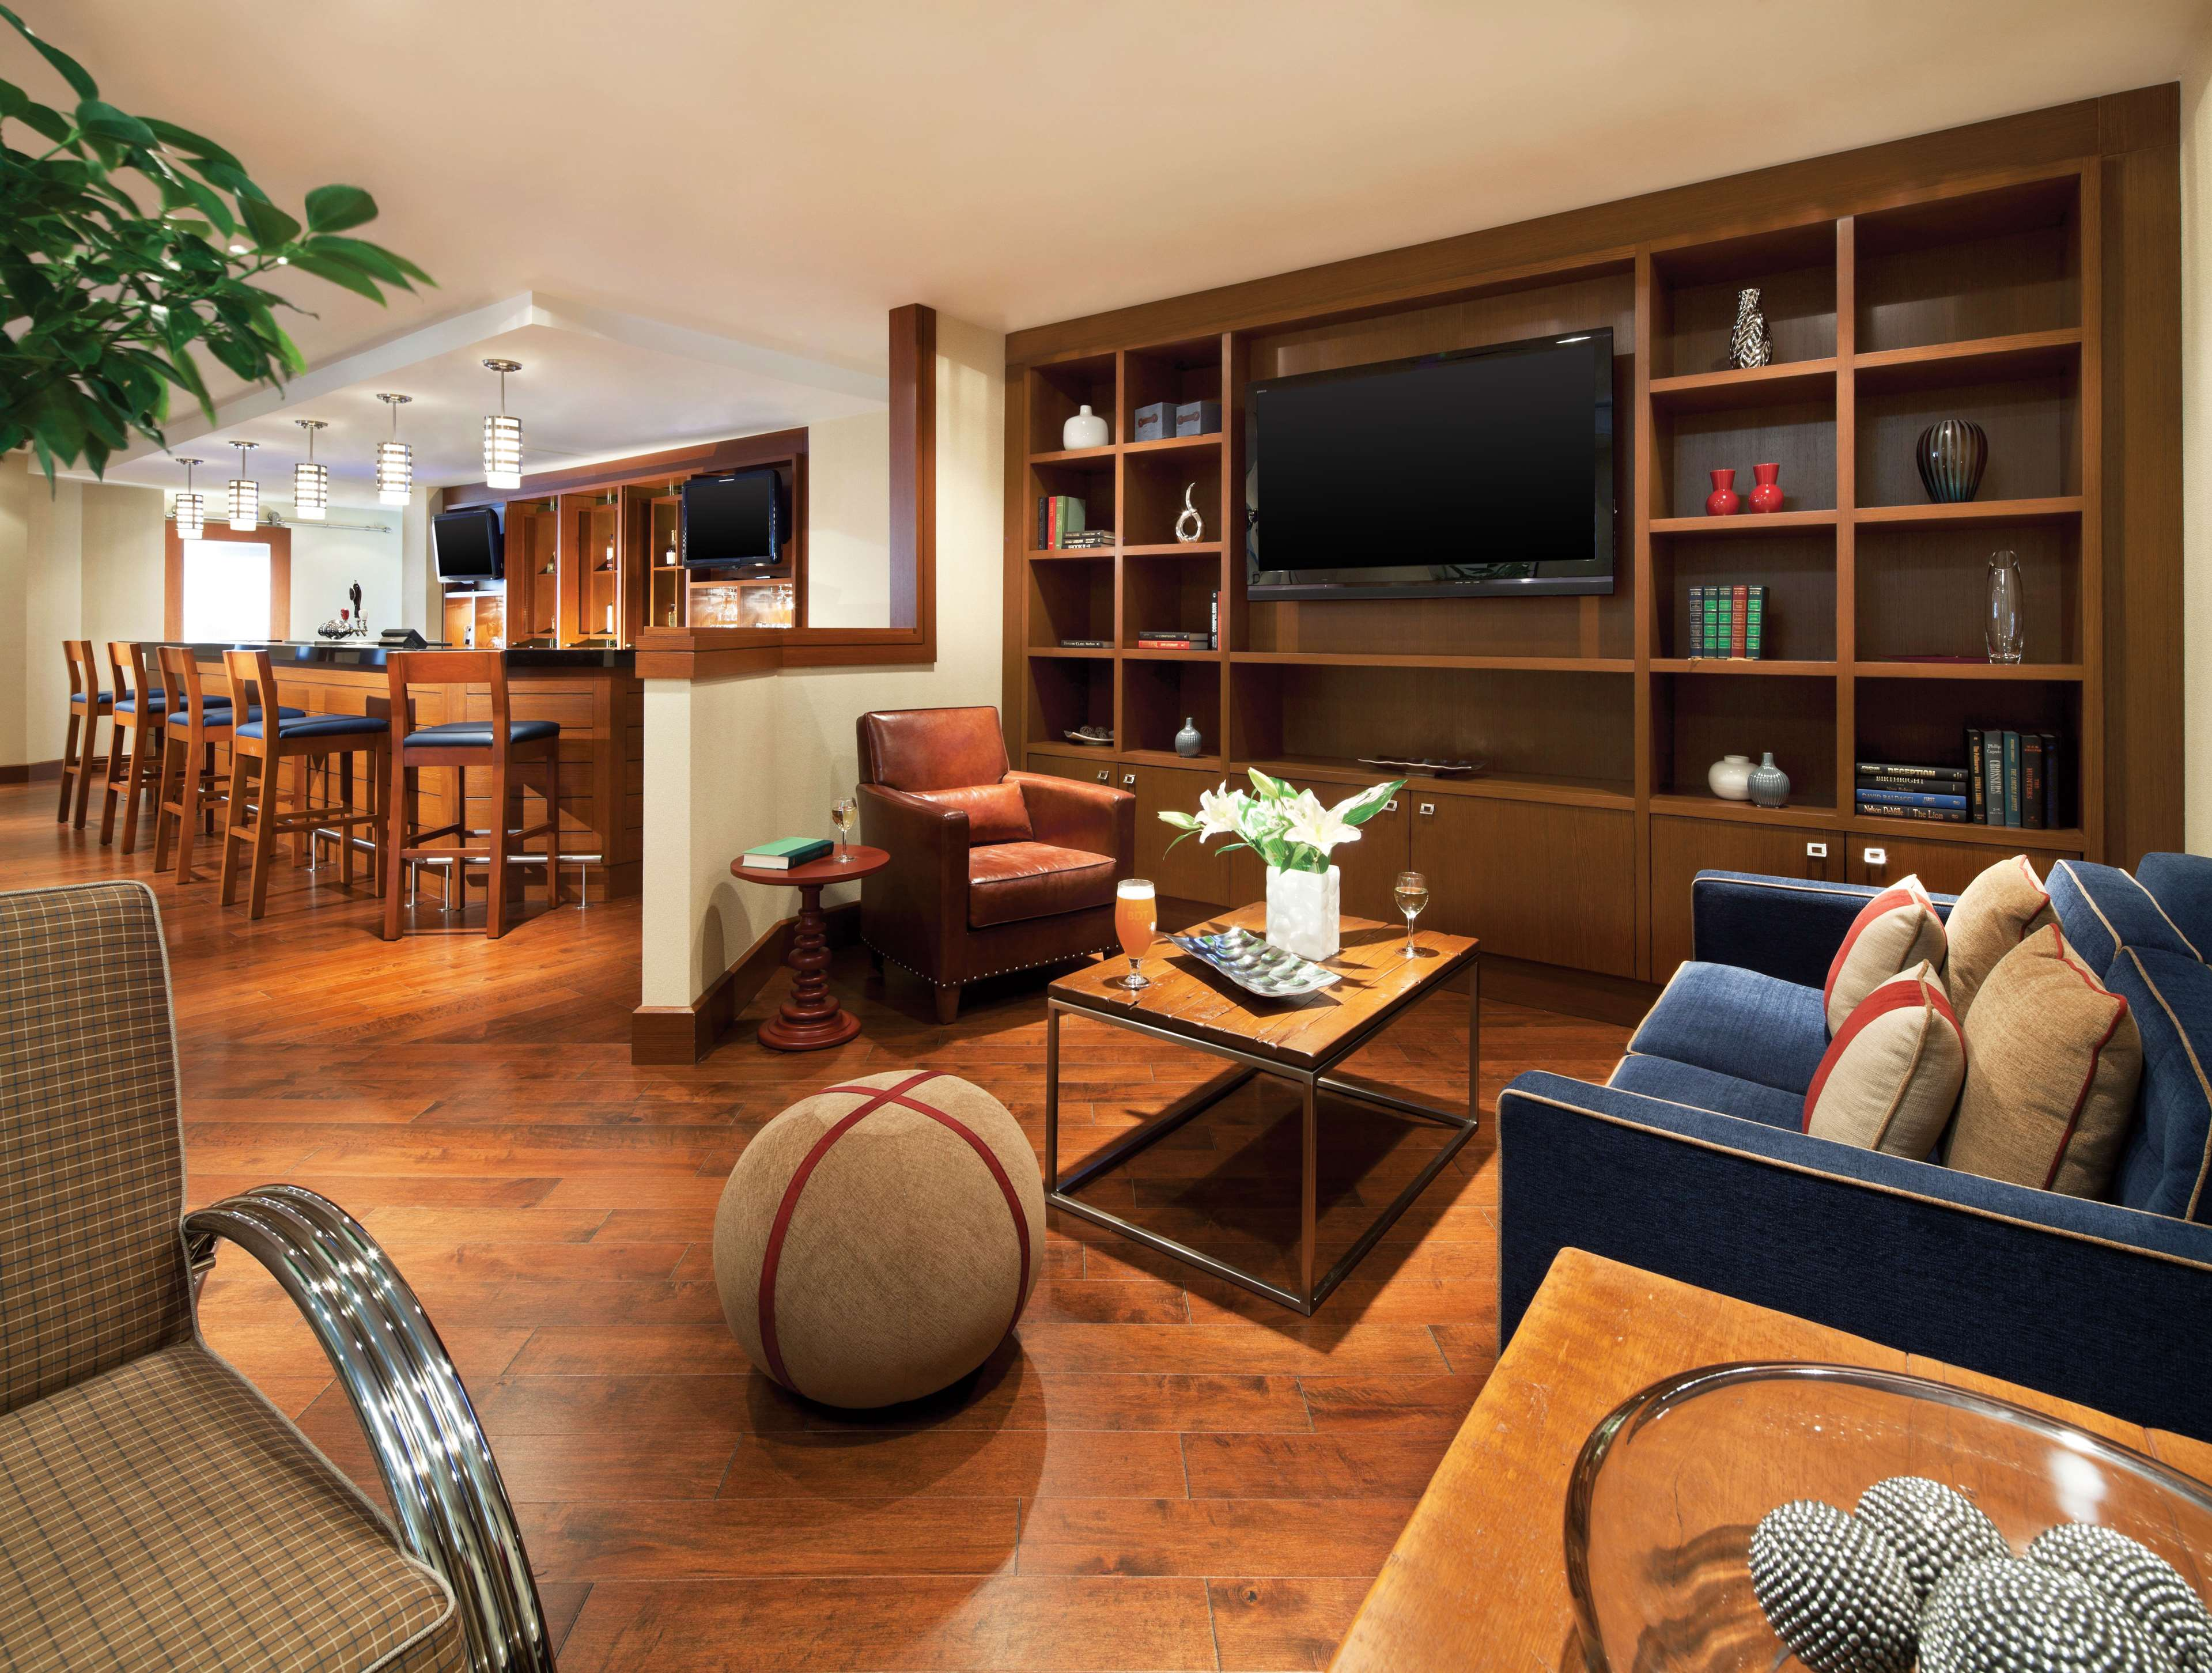 Four Points by Sheraton Hotel & Conference Centre Gatineau-Ottawa à Gatineau: Library / Lounge